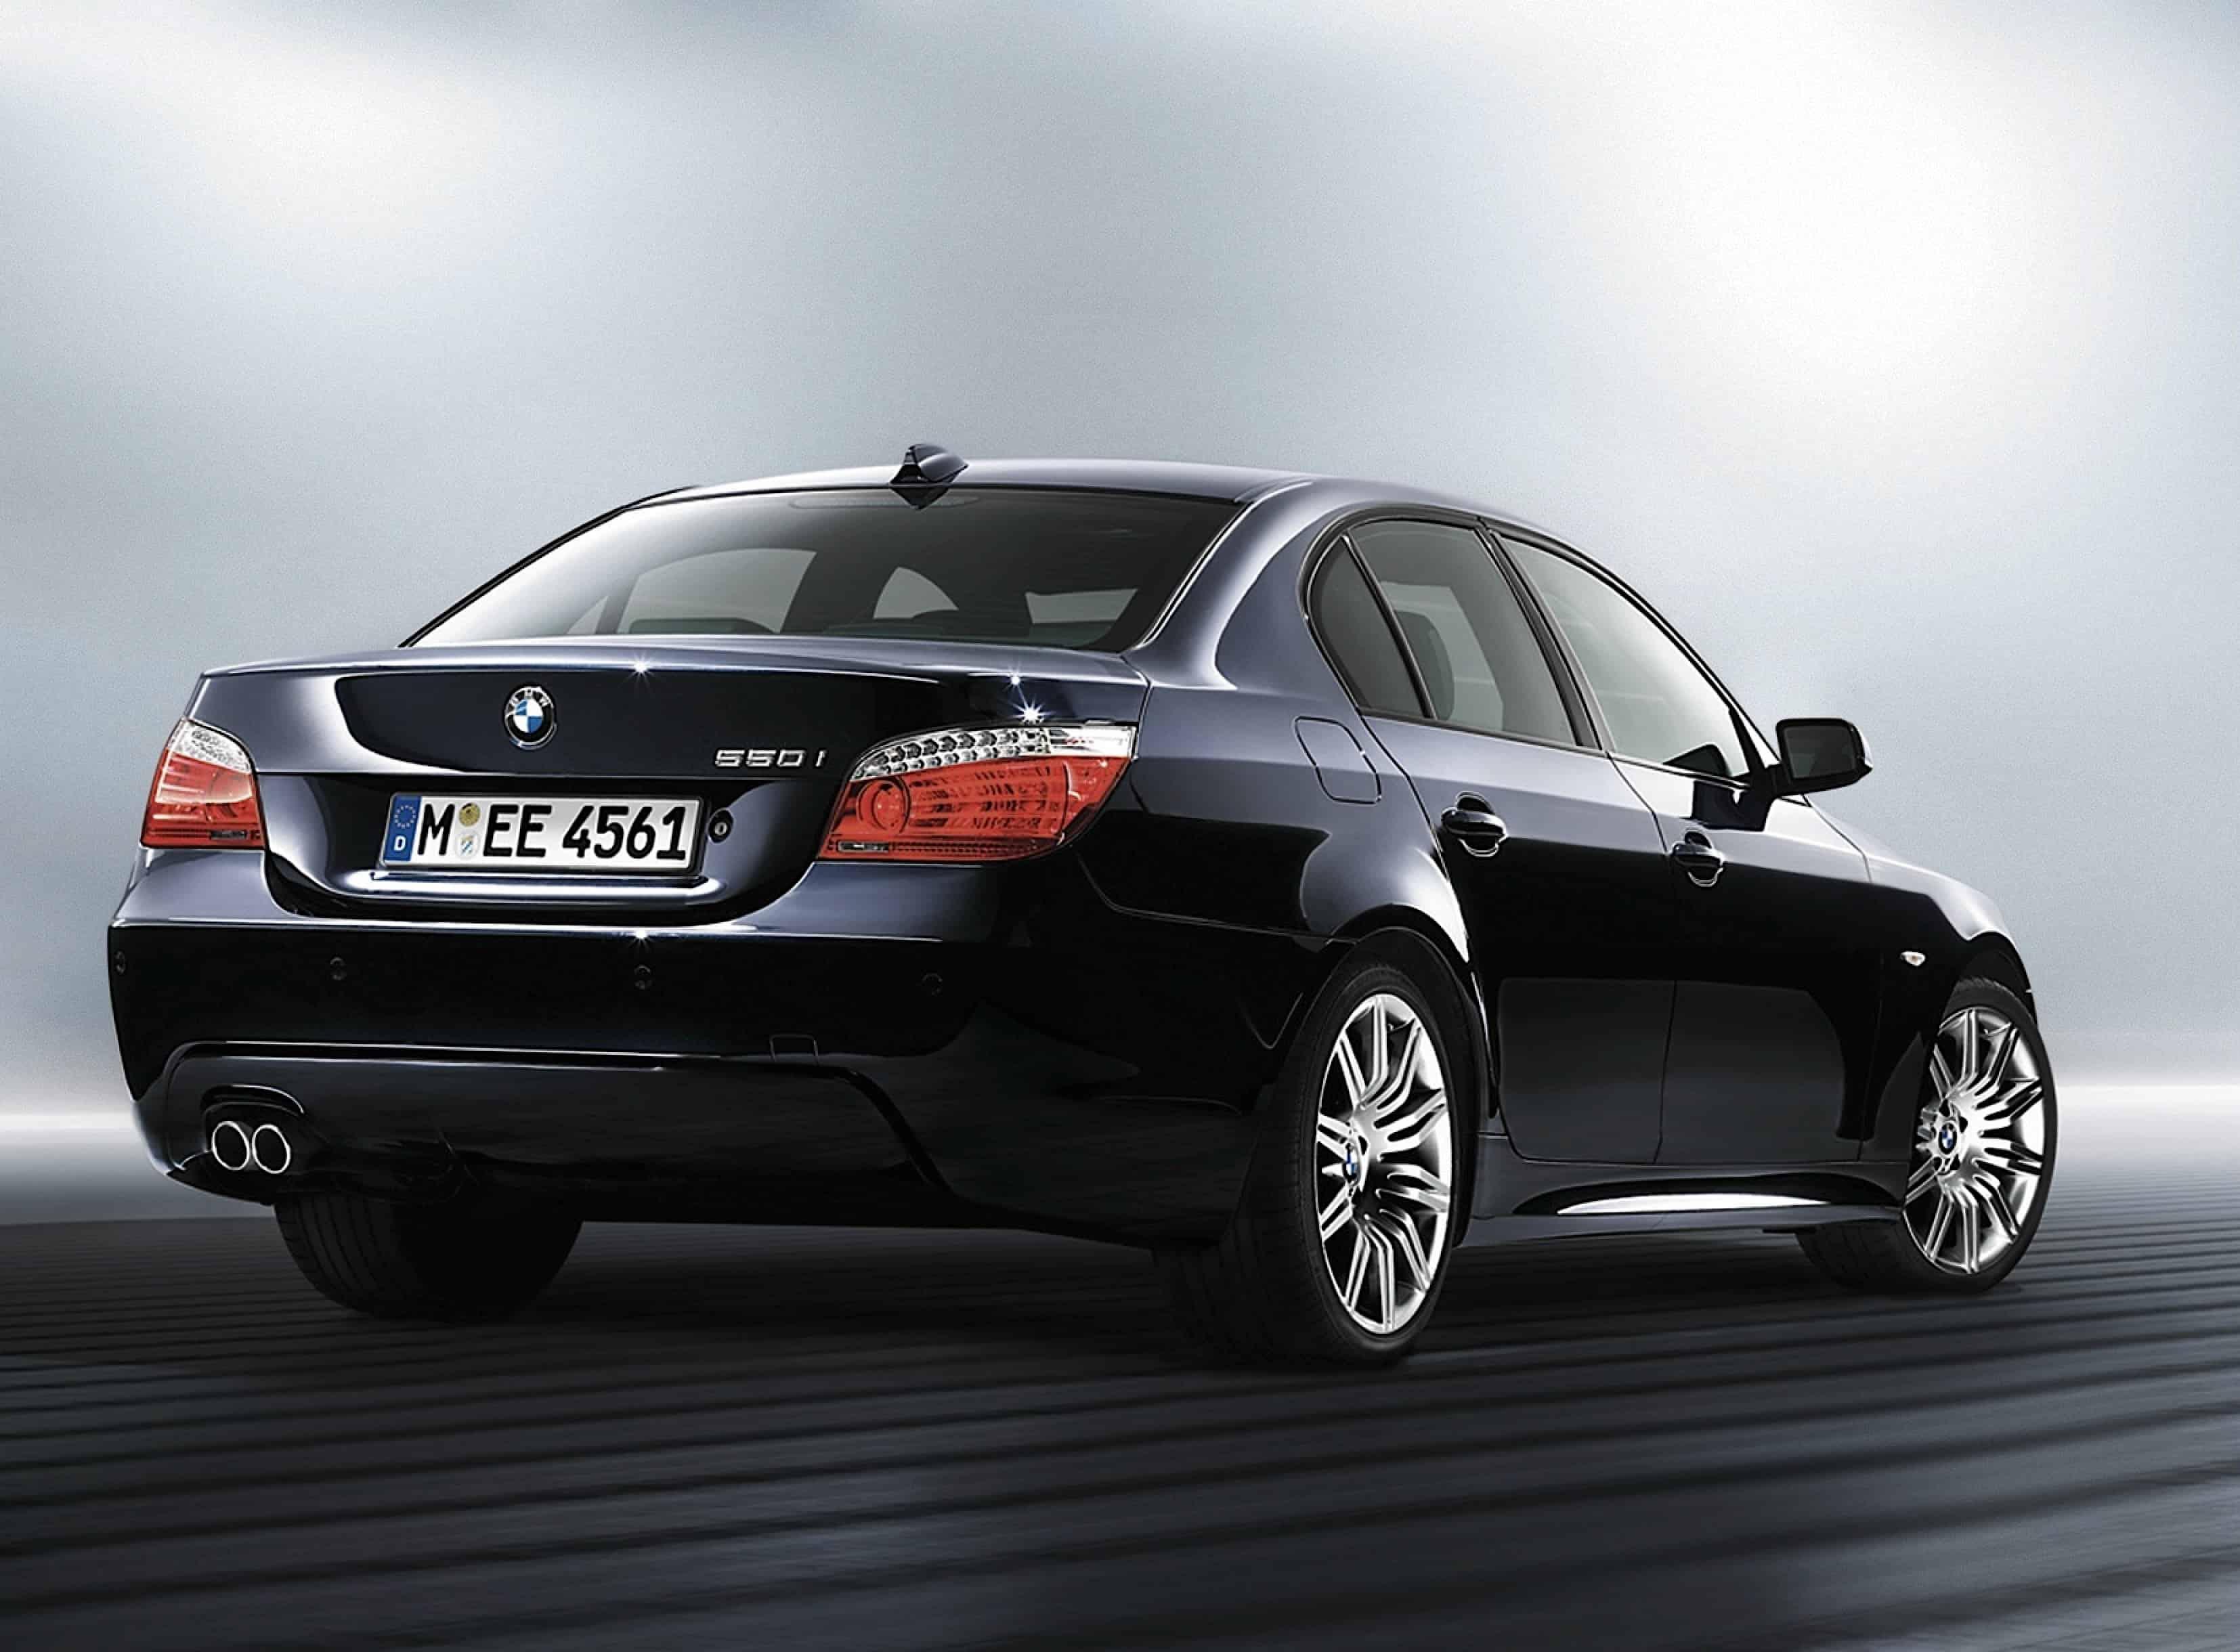 BMW E60 style 172m